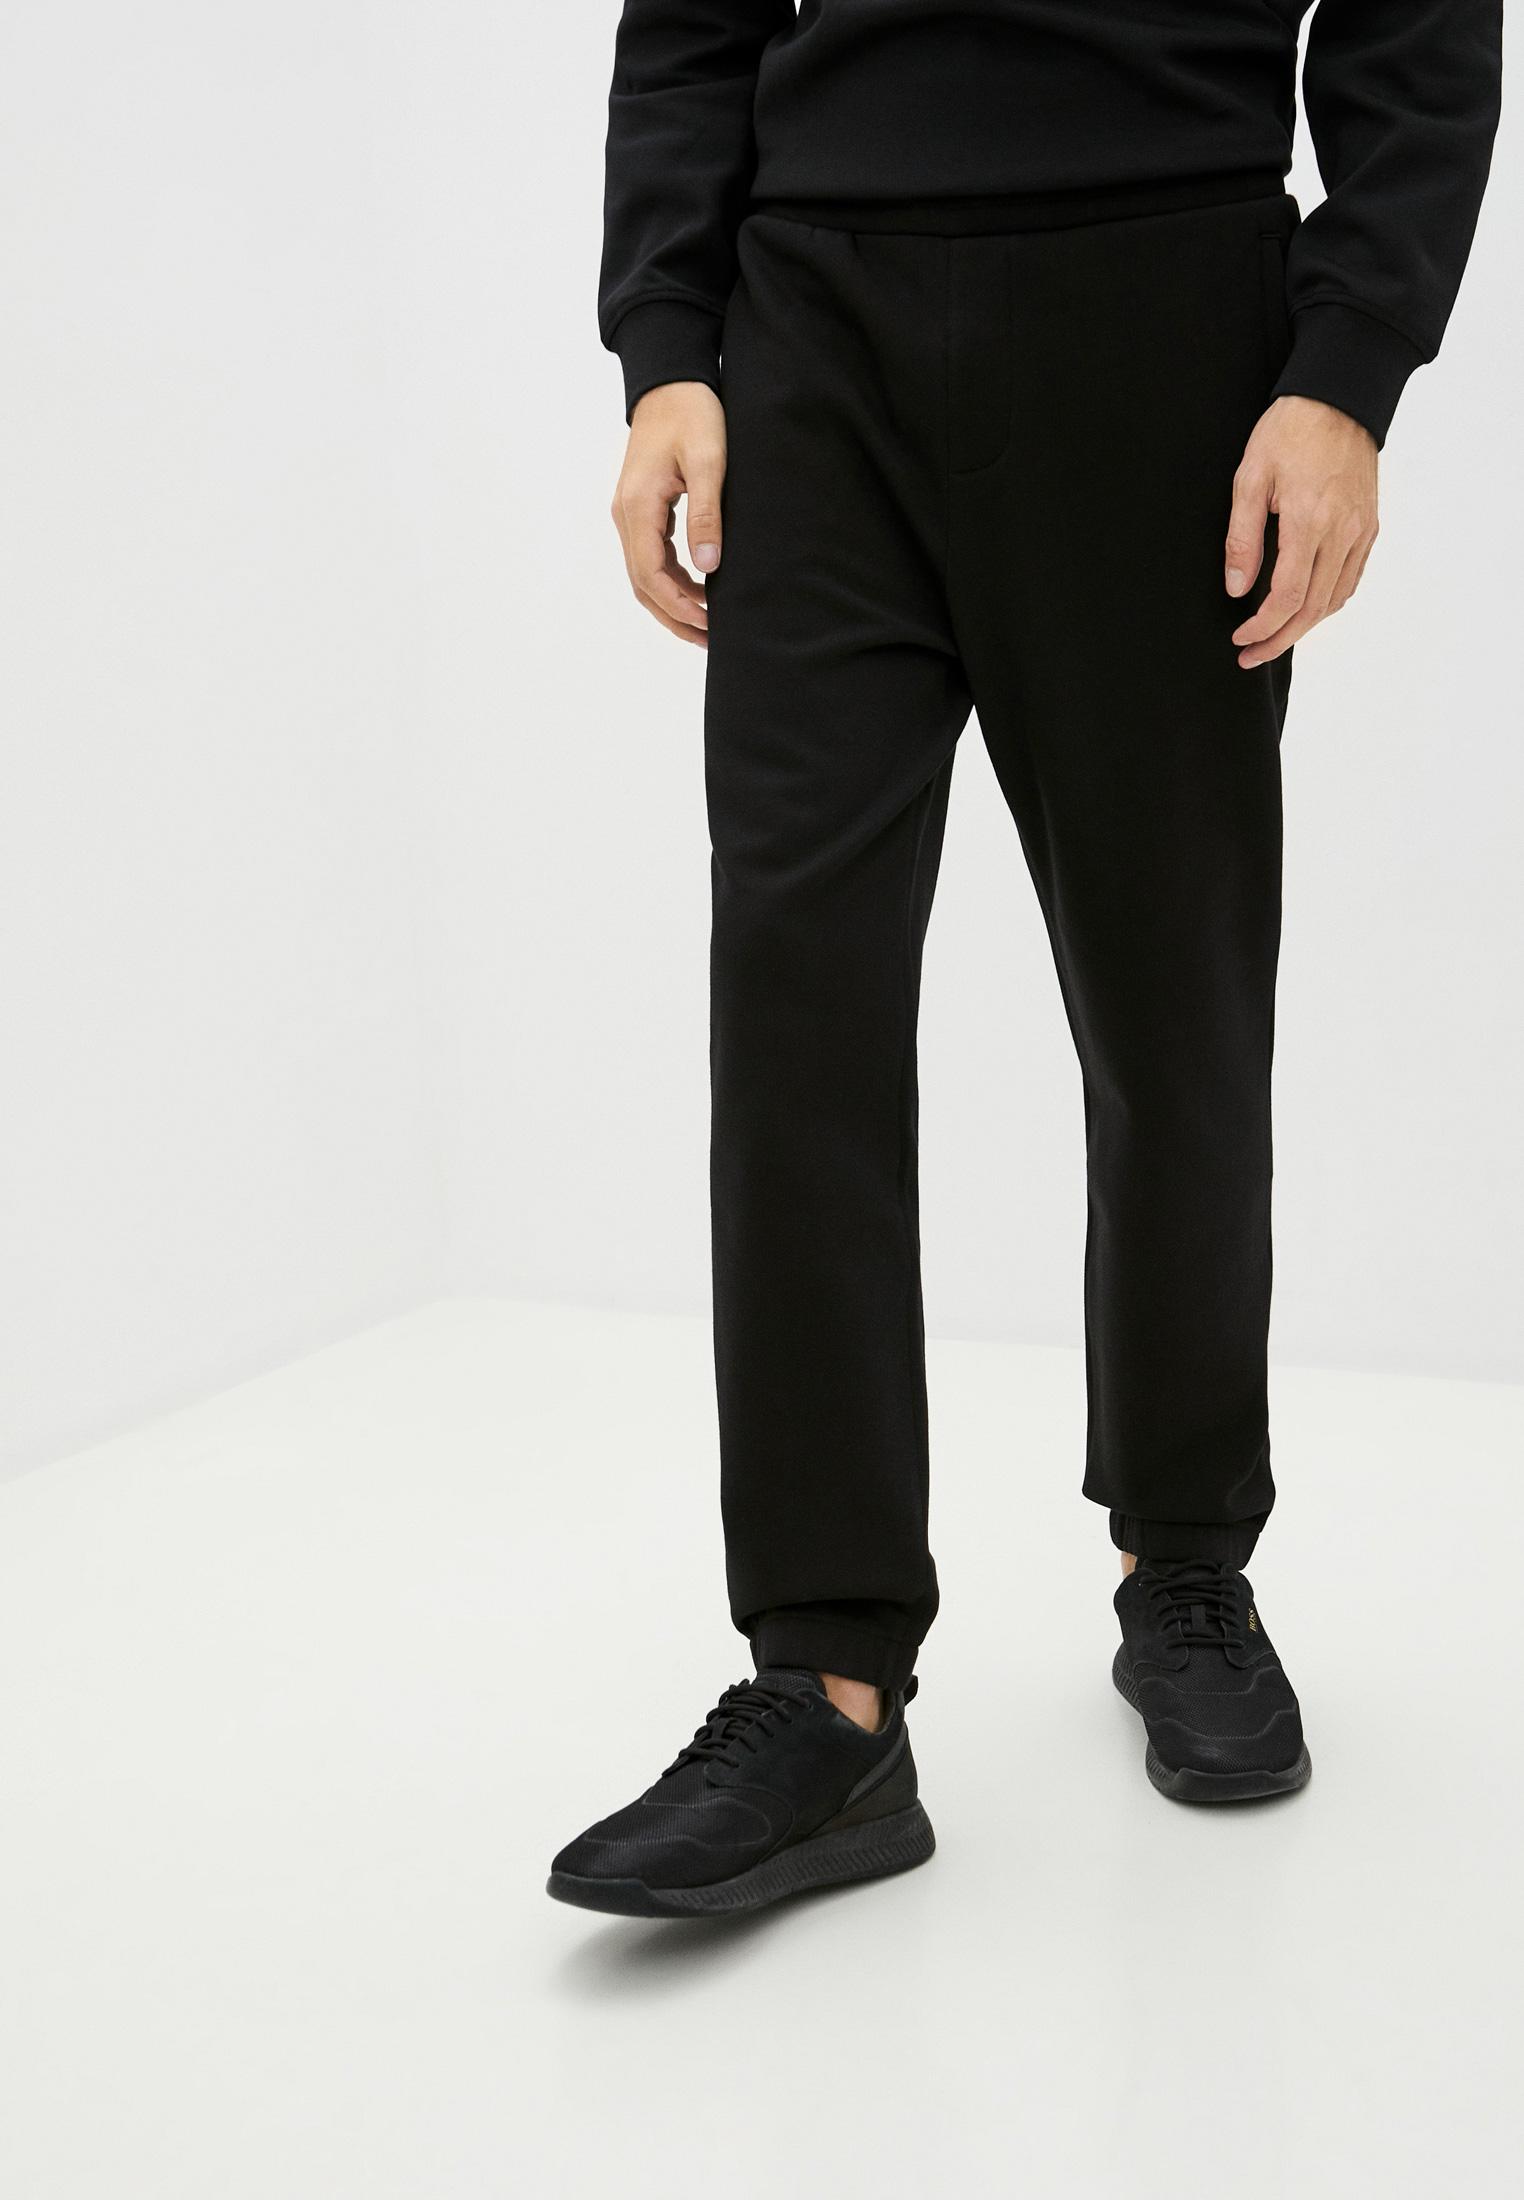 Мужские спортивные брюки Armani Exchange 6hzpfn ZJ1PZ